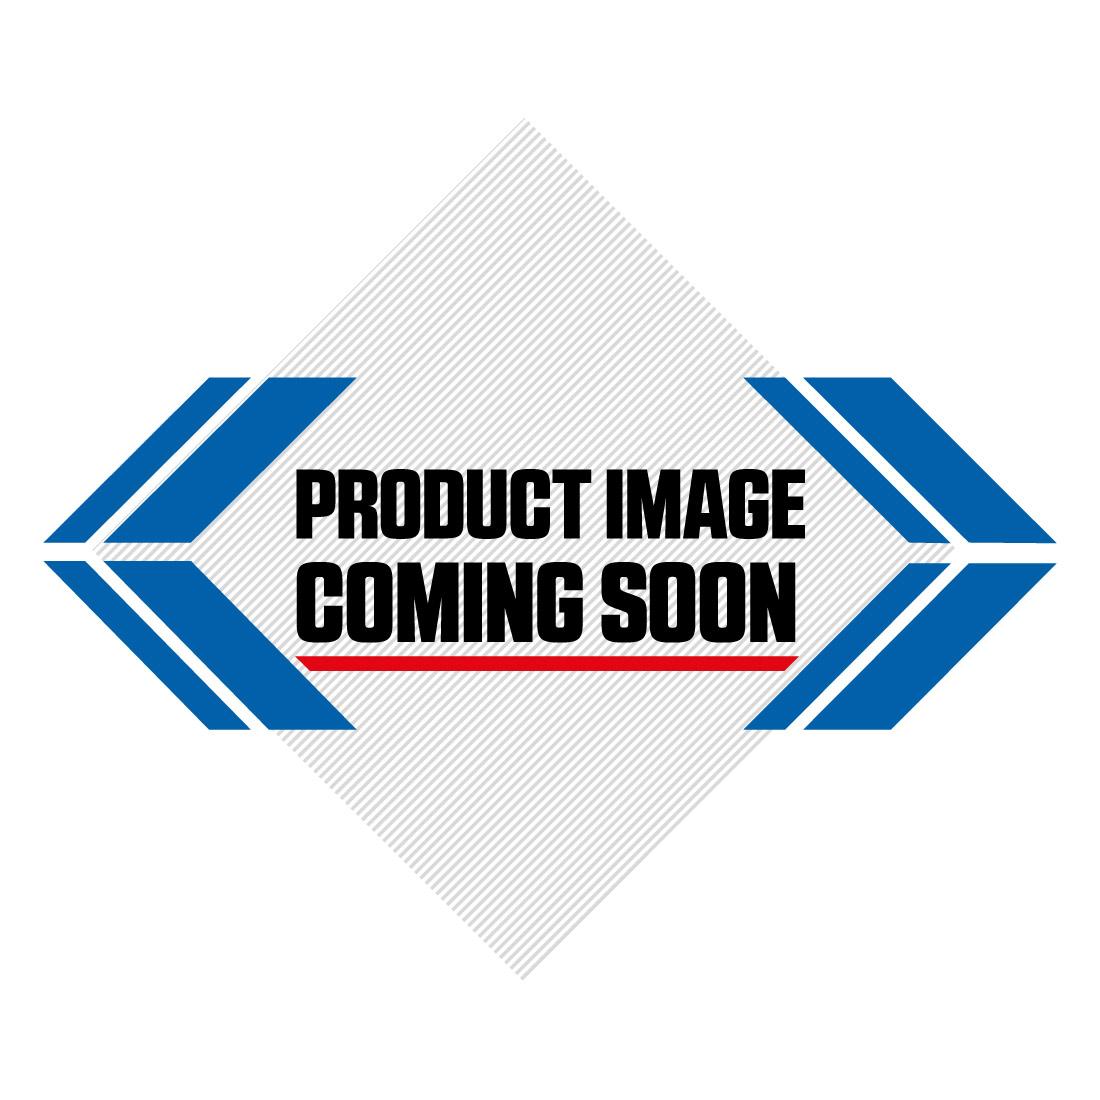 UFO KTM Plastic Kit SX 125 150 250 SXF 250 350 450 (16-18) White Image-2>